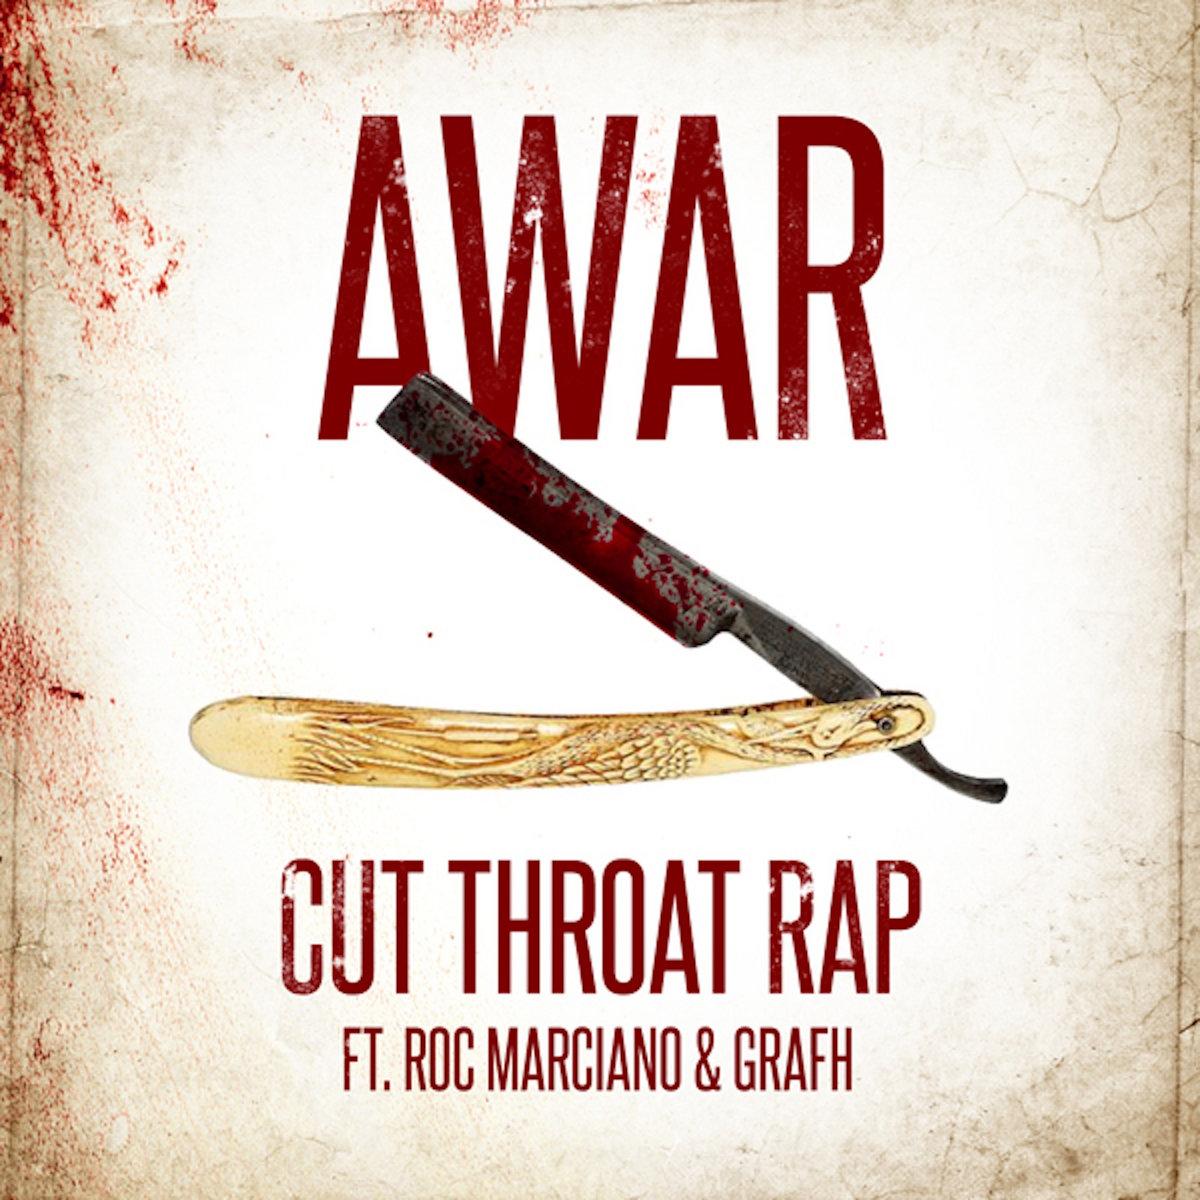 Cut Throat Rap Feat Roc Marciano Grafh Produced By